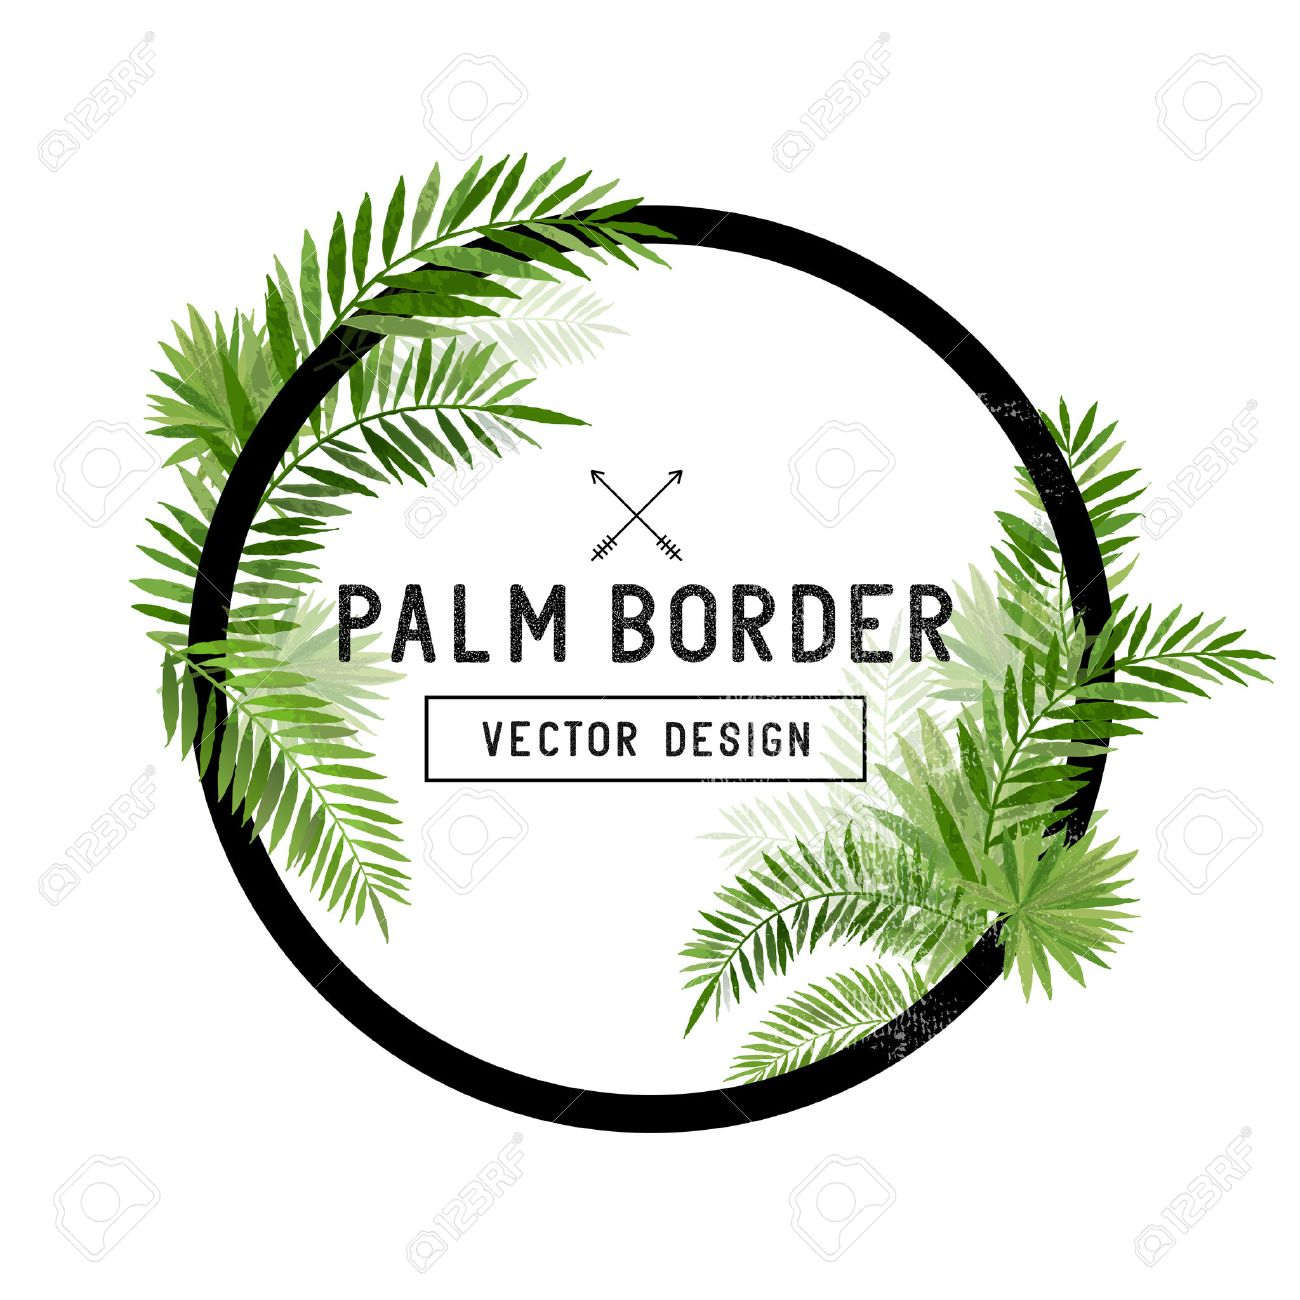 Tropical Palm Leaf Border Vector. summer Palm tree leaves around a circle border. Vector illuatration. - 54312286